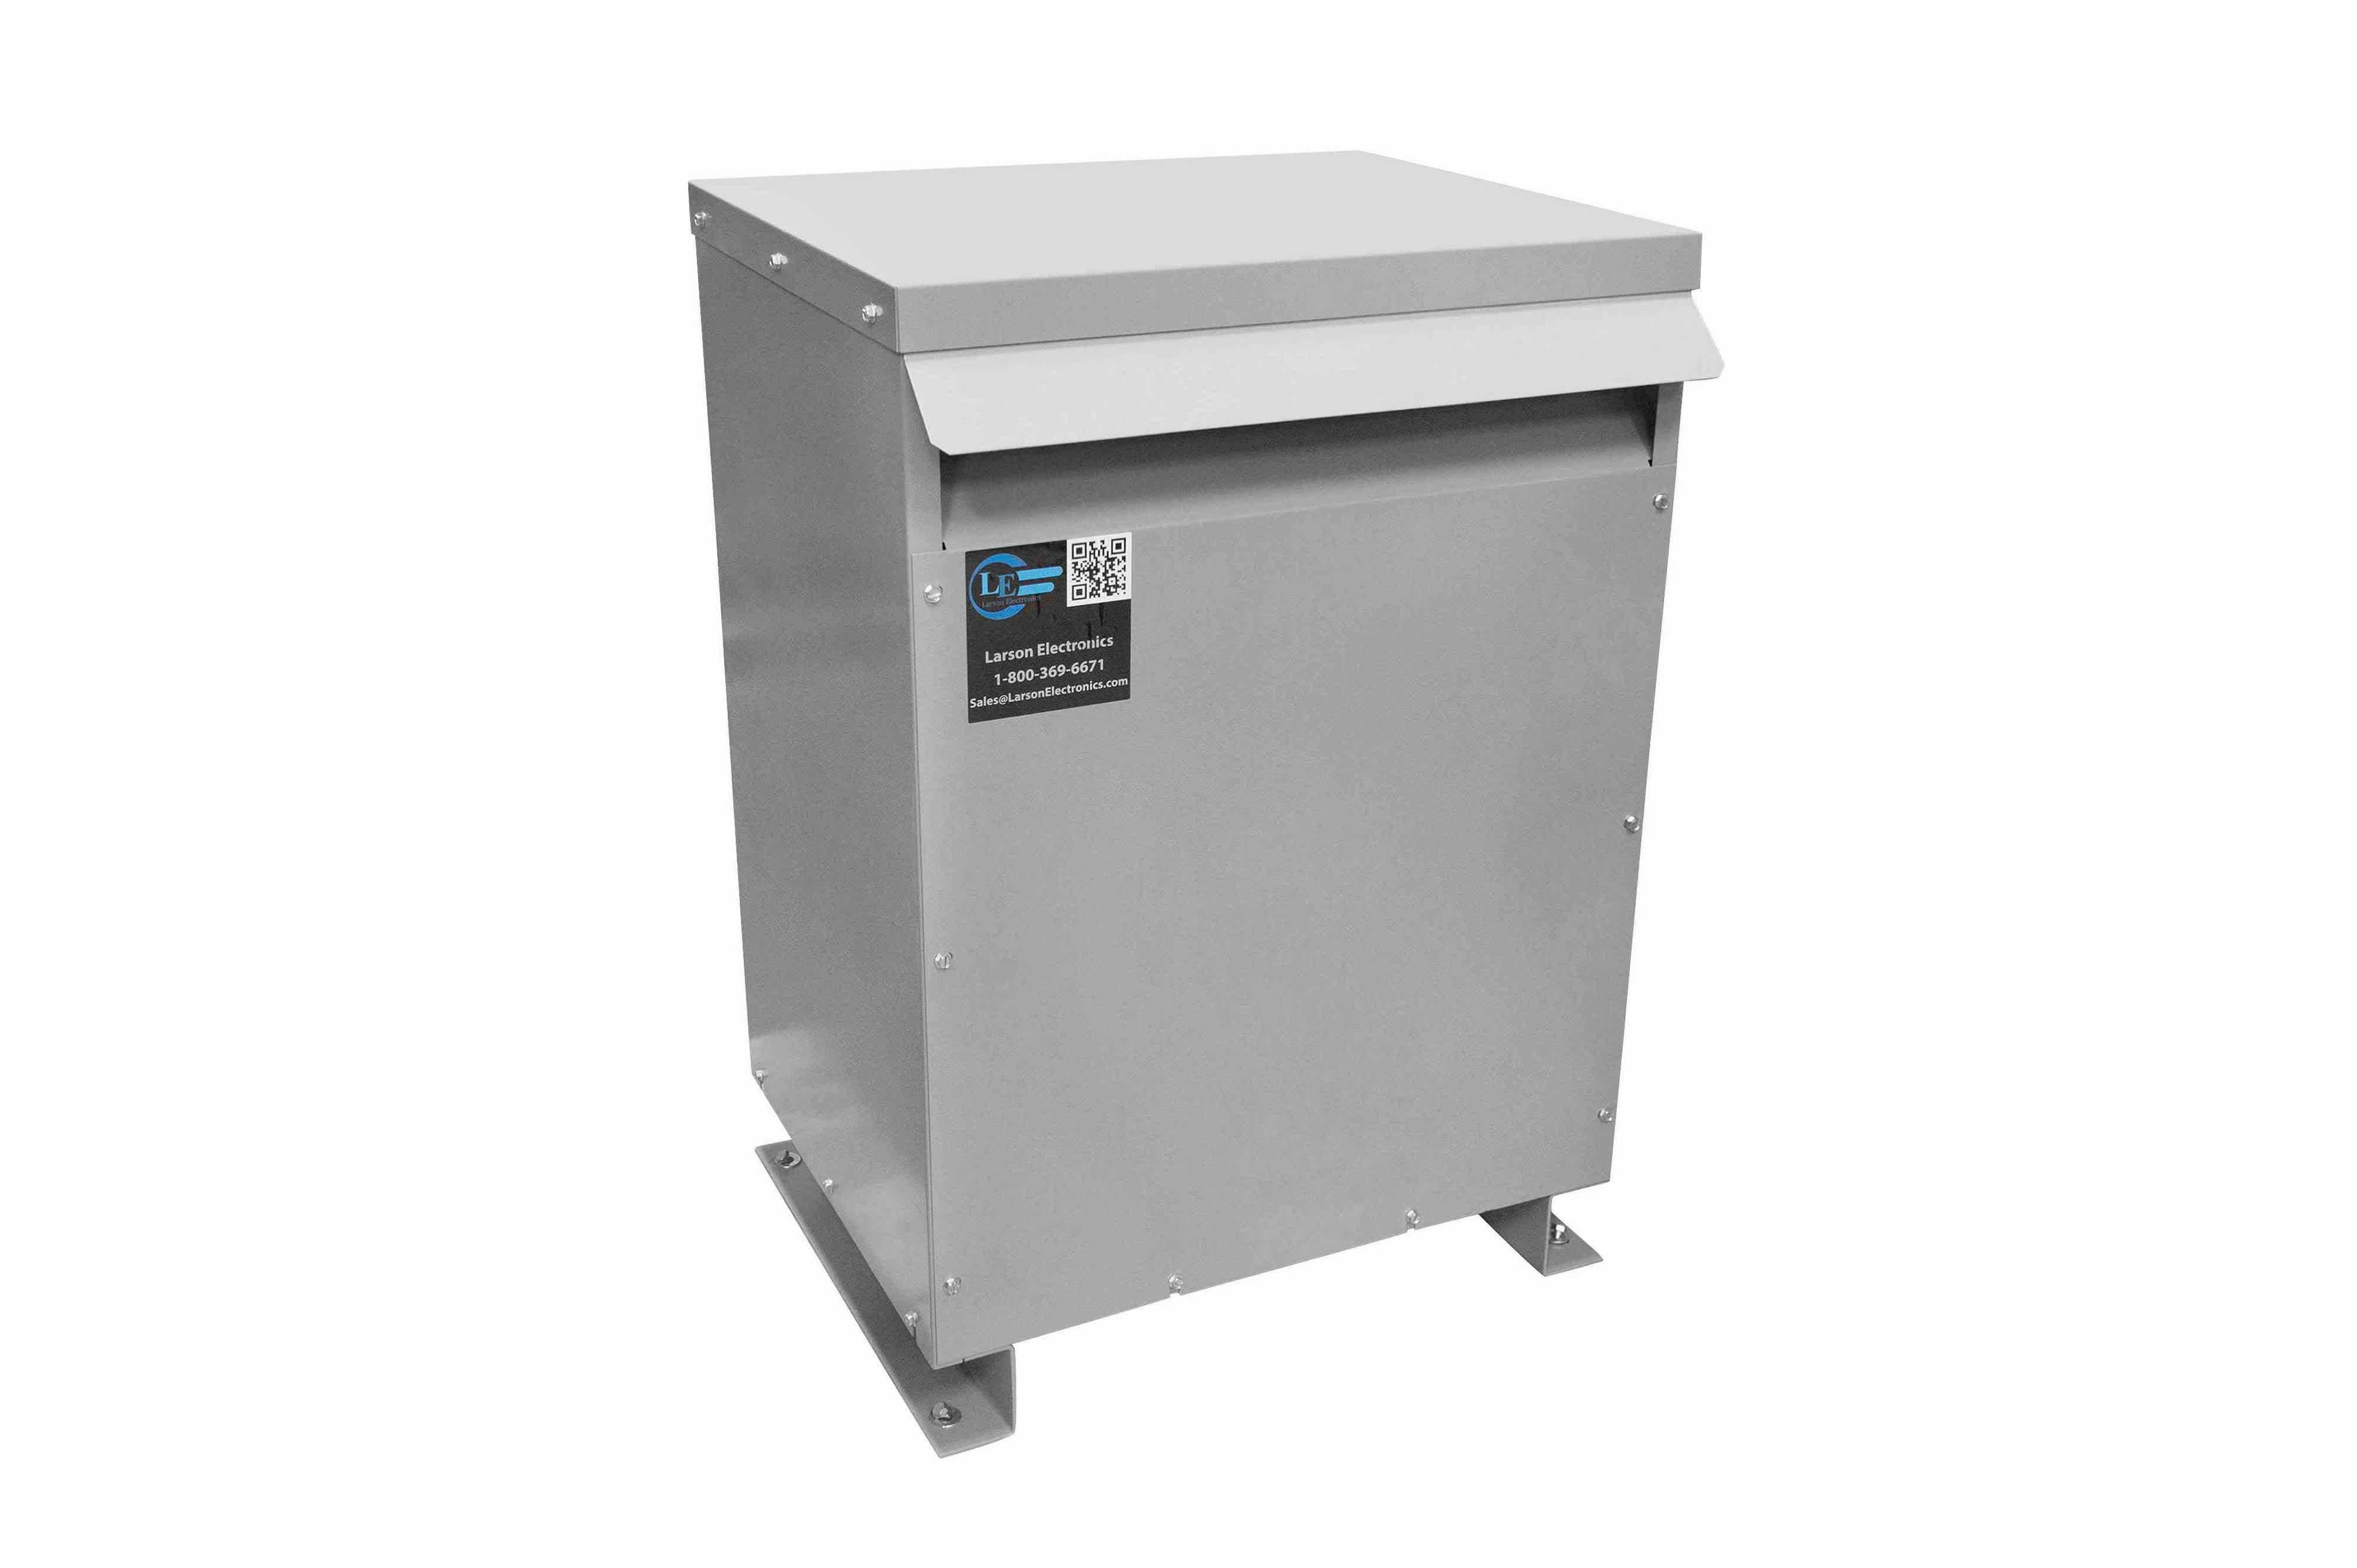 14 kVA 3PH Isolation Transformer, 208V Wye Primary, 480V Delta Secondary, N3R, Ventilated, 60 Hz